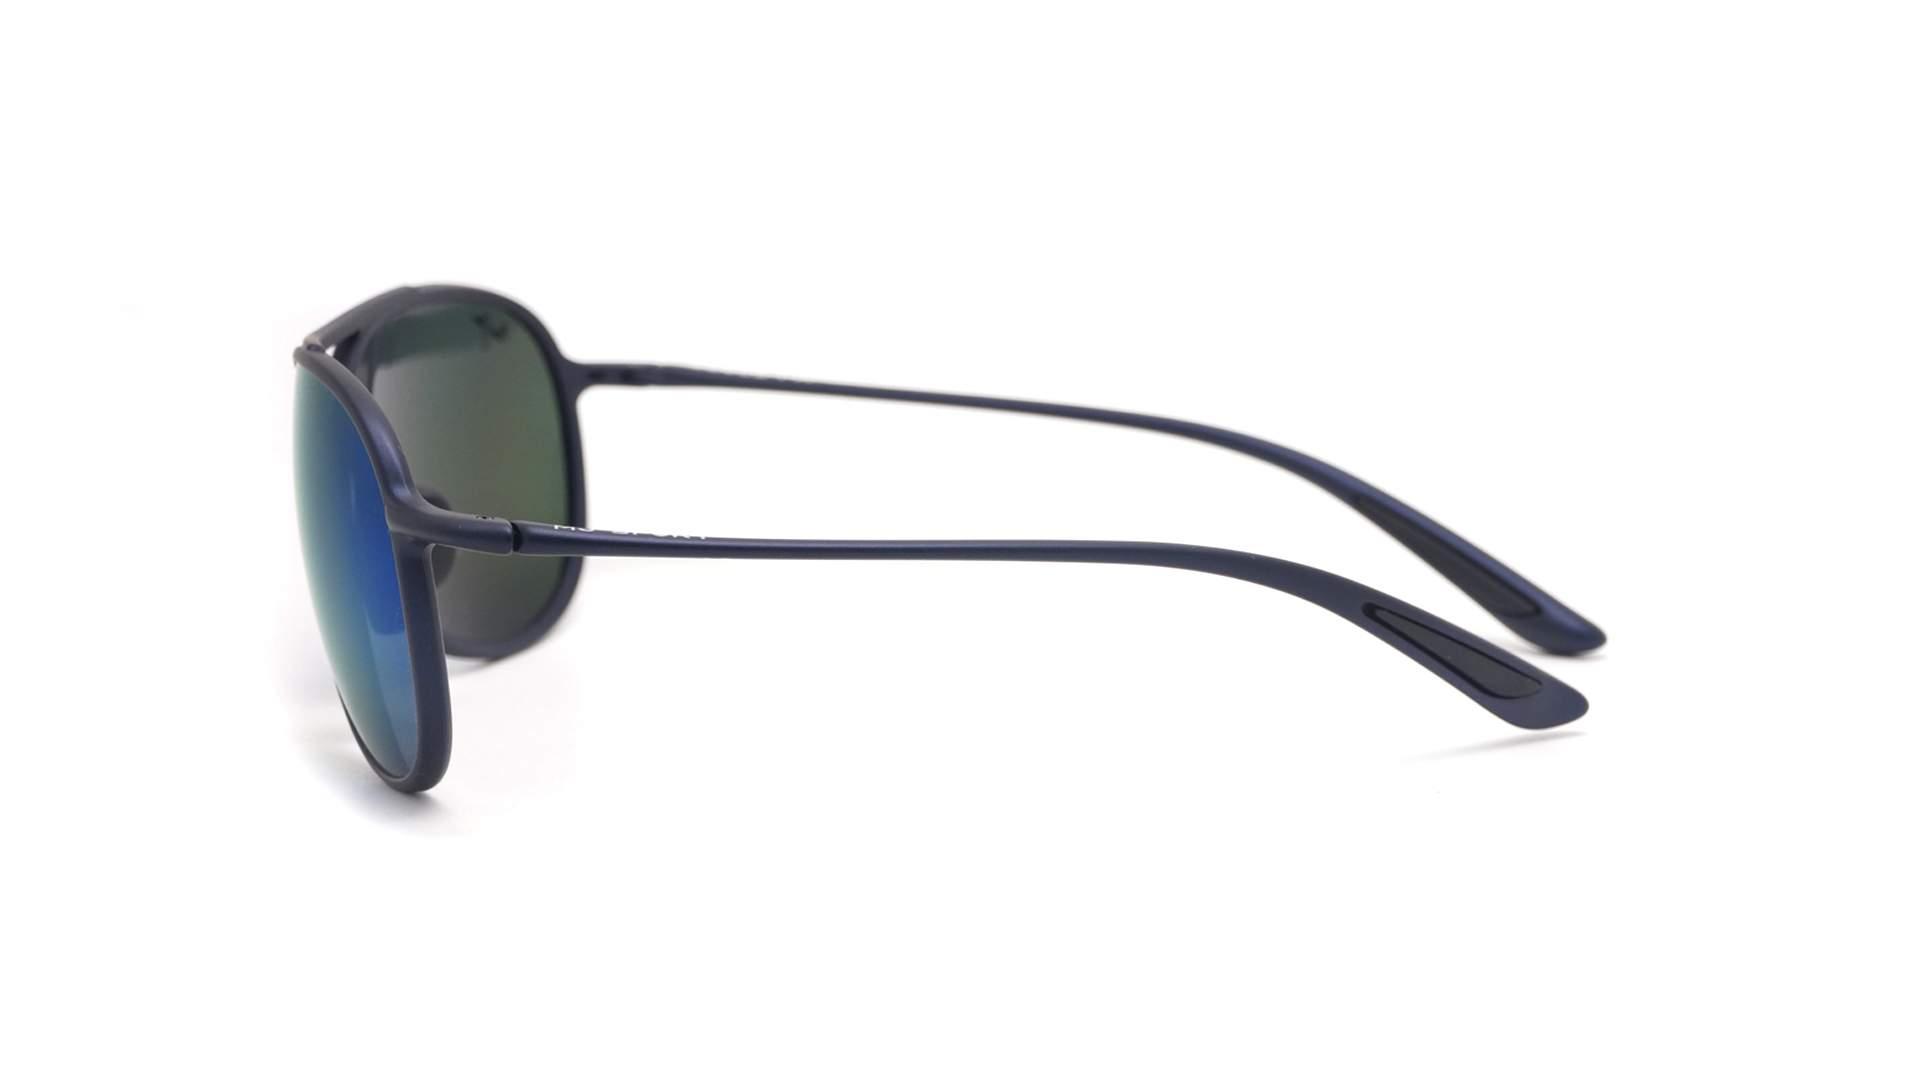 8315be175b Sunglasses Maui Jim Kaupo gap Blue Matte Maui brillant B43703M 61-15 Large  Polarized Gradient Mirror